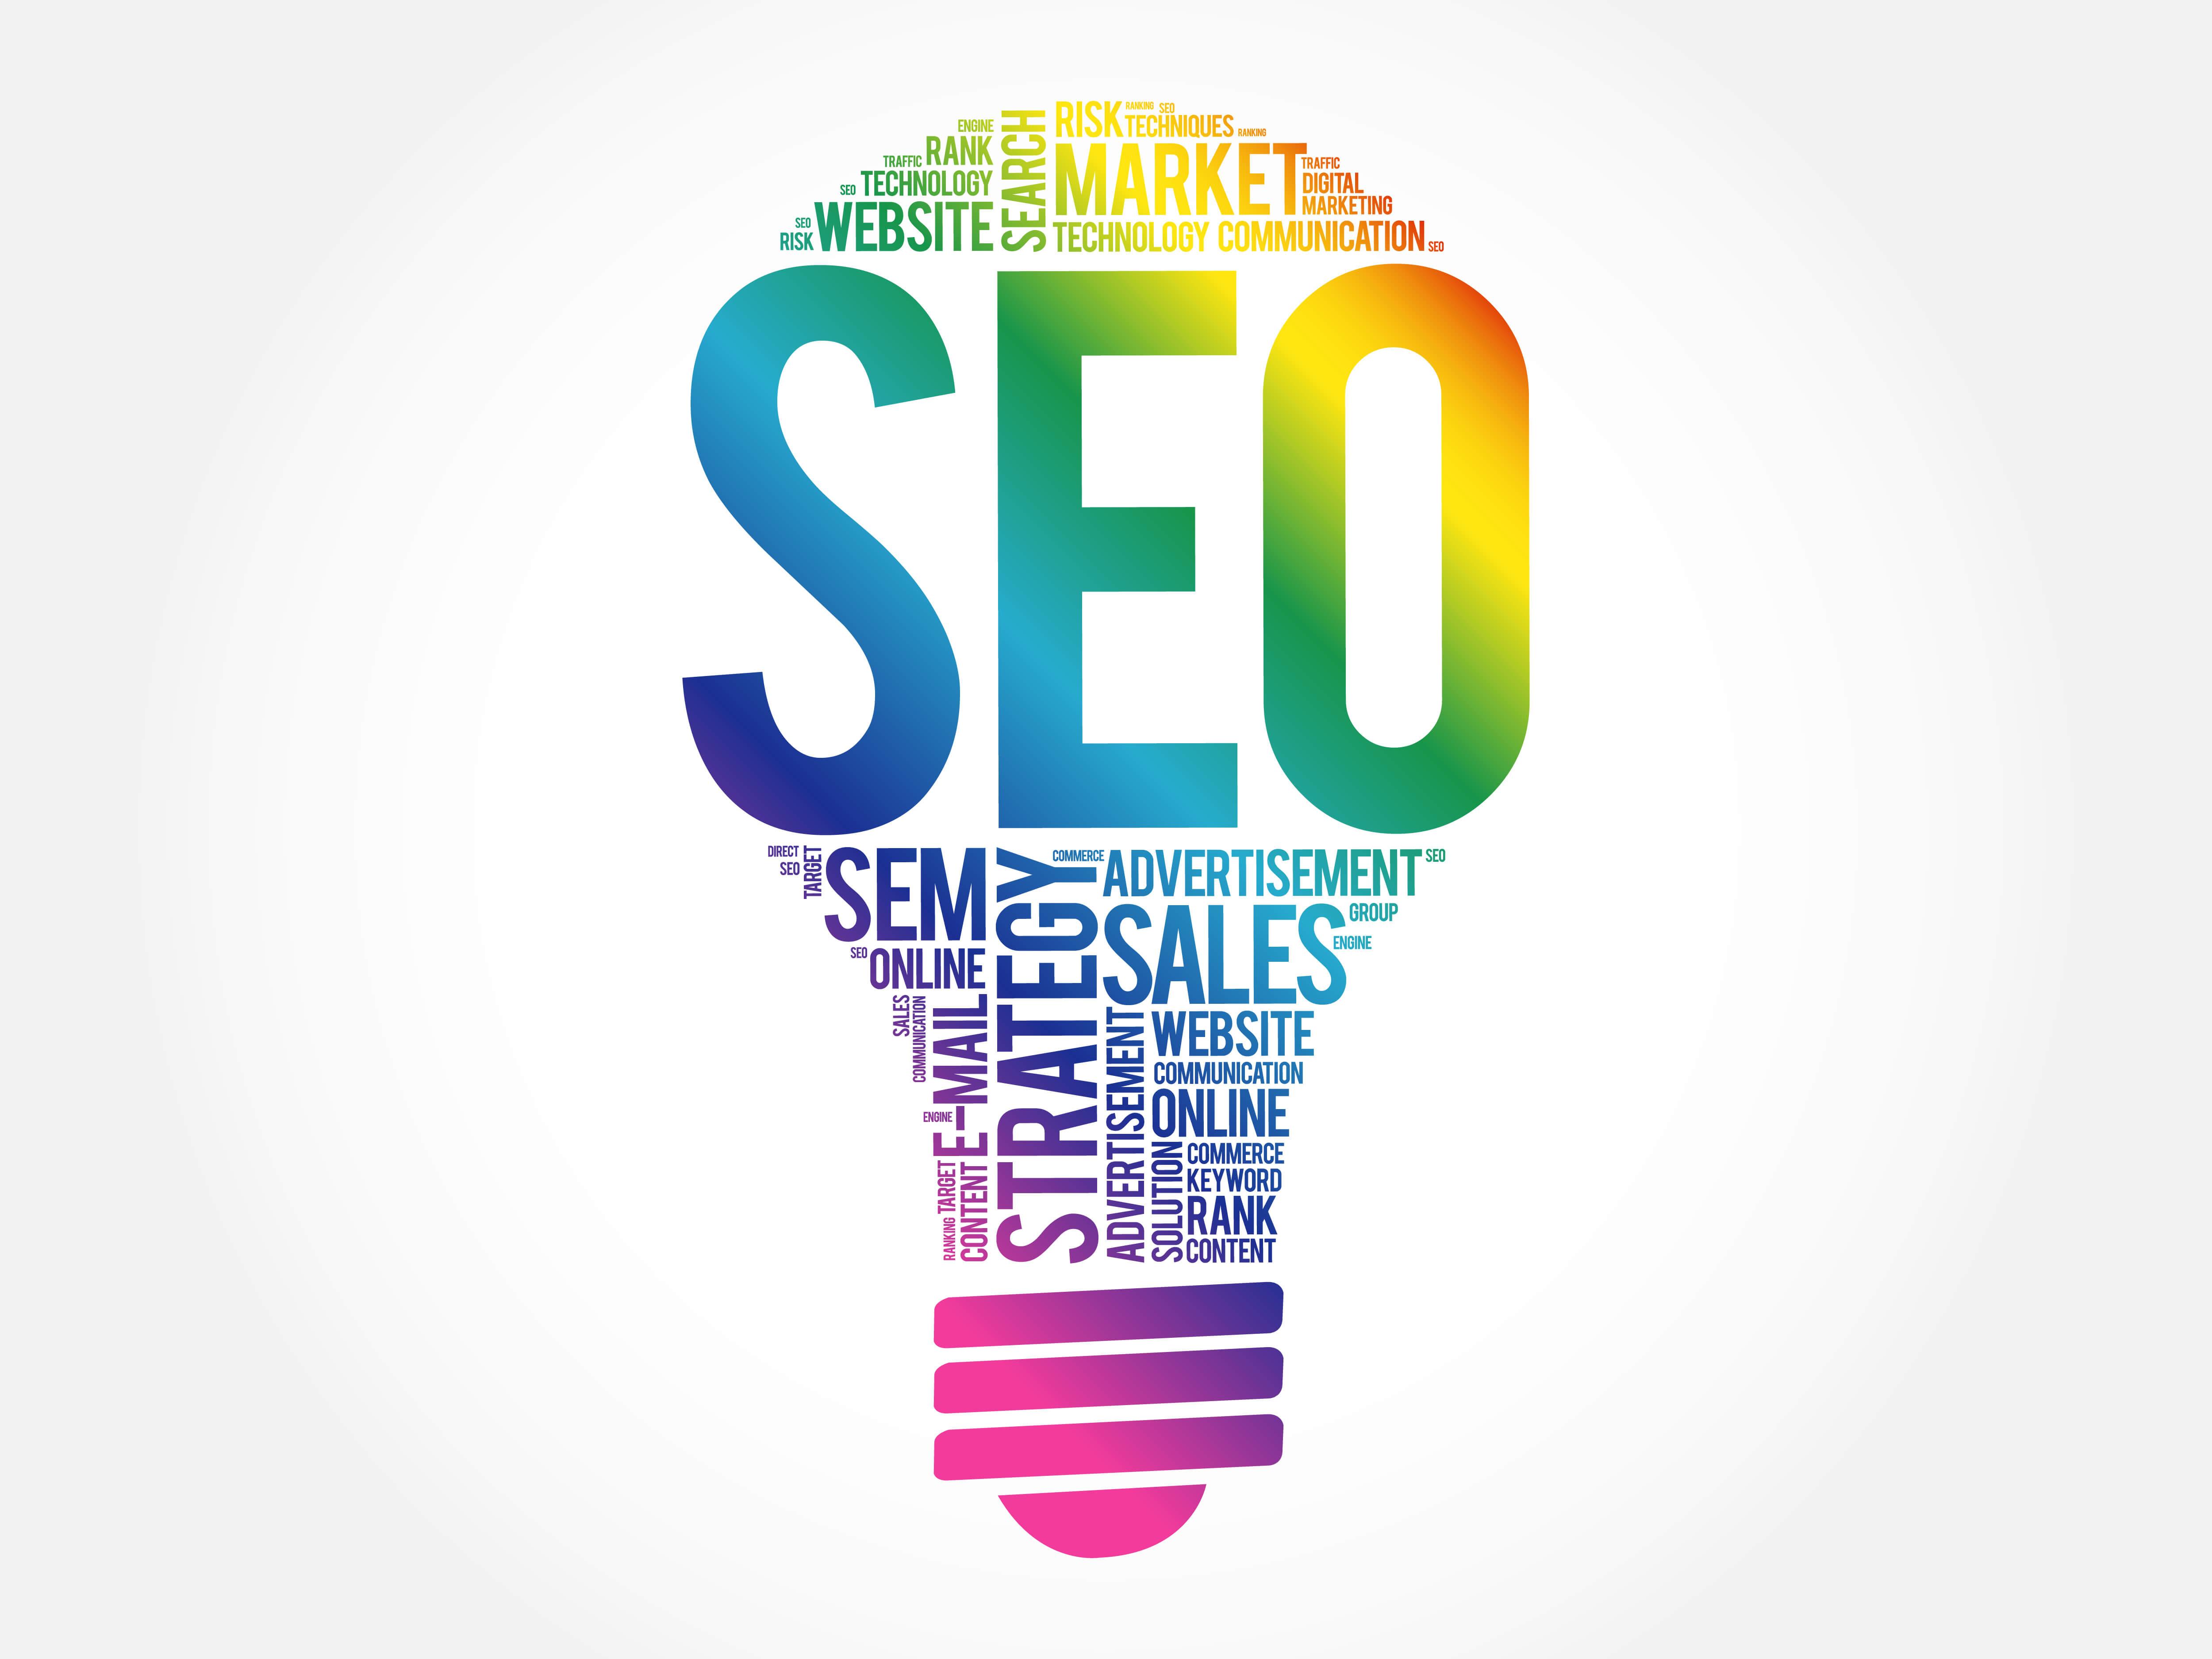 seo search engine optimization techniques